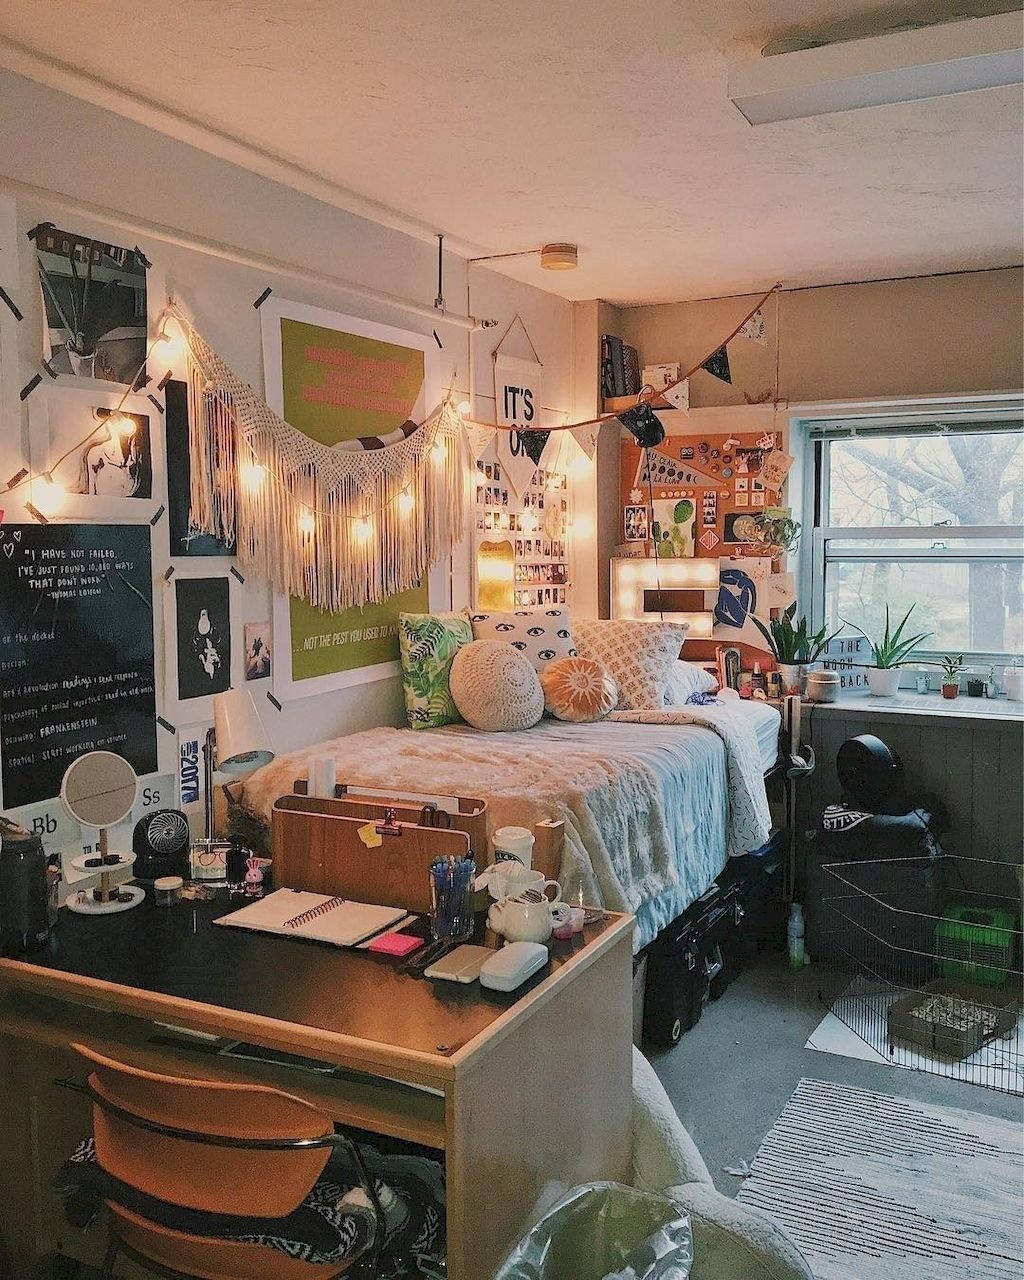 Efficient Dorm Room Organization Decor Ideas 12 Dorm Room Diy Cool Dorm Rooms Dorm Room Inspiration Dorm room decoration ideas